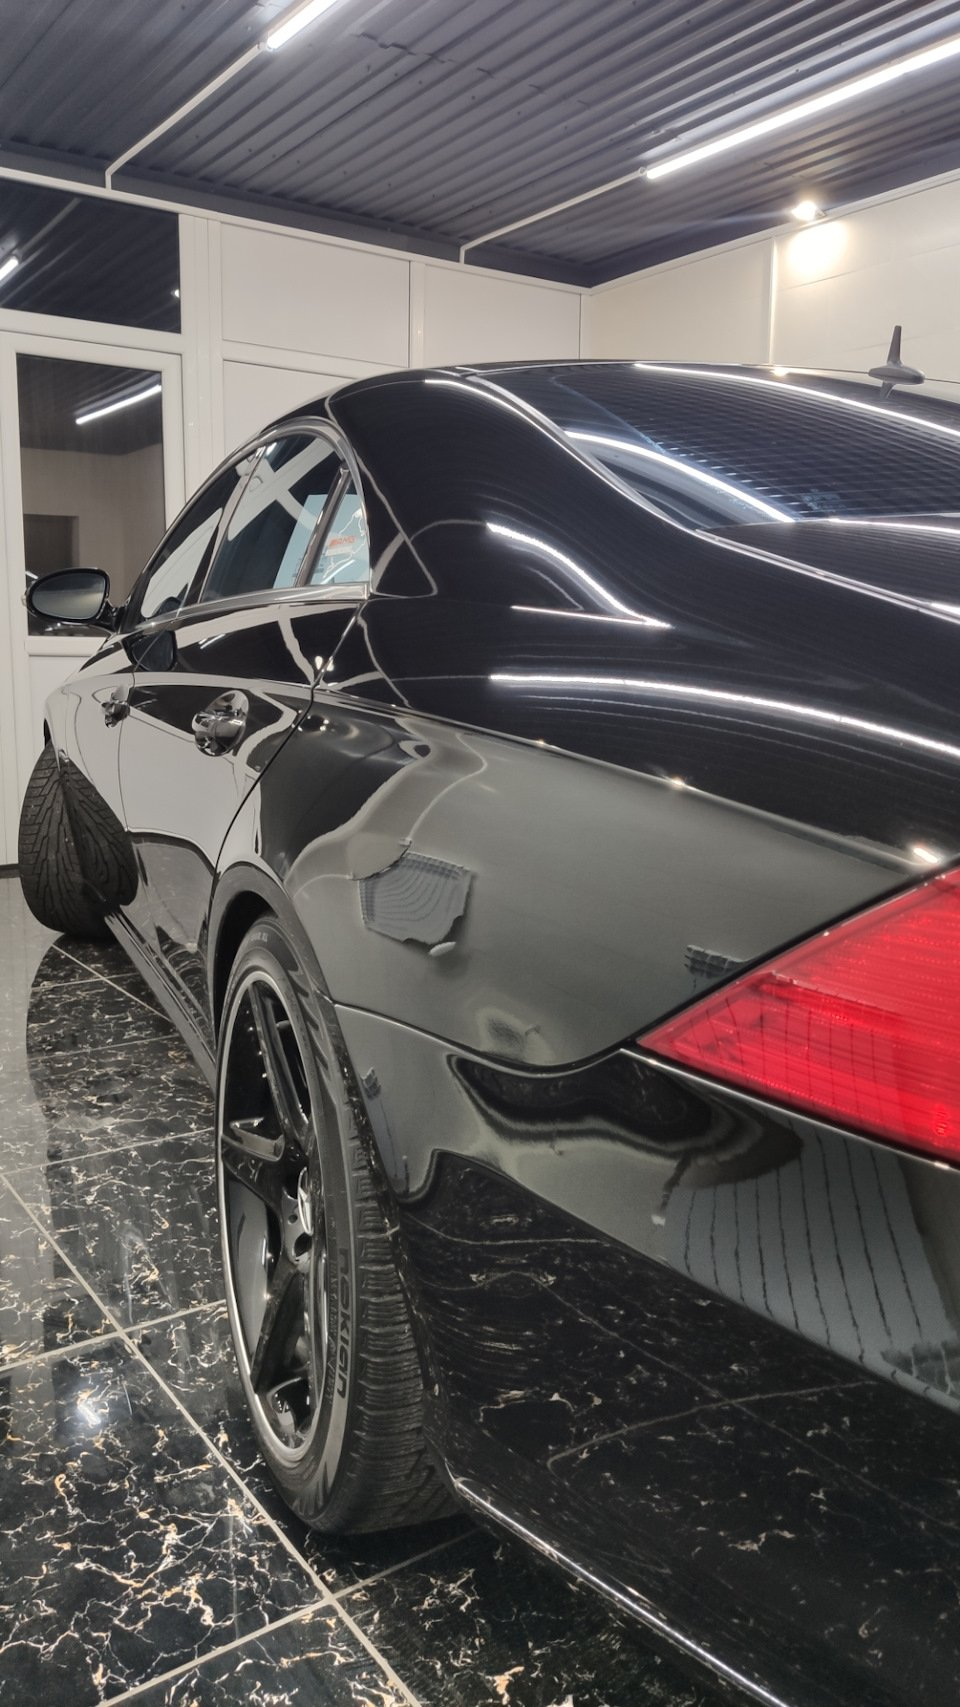 Mercedes CLS55 AMG Black (24)